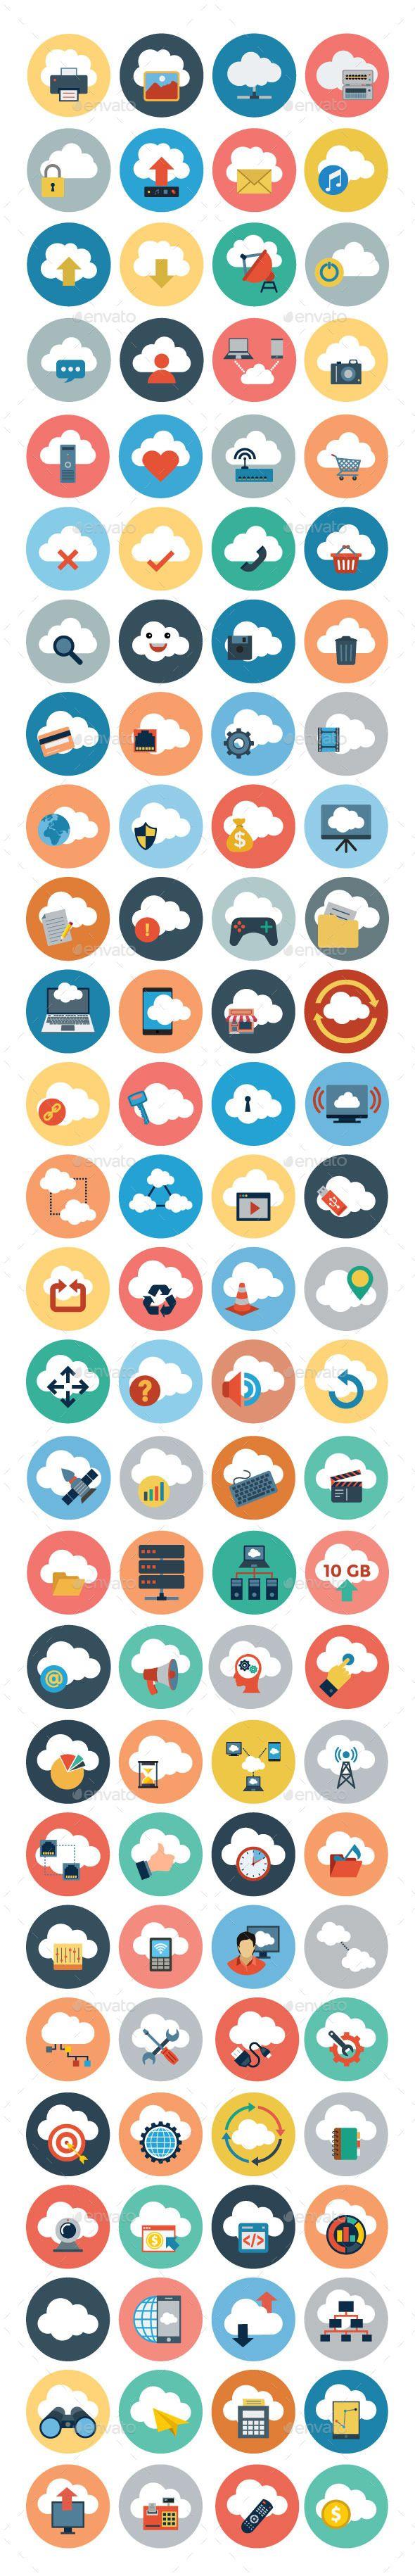 100+ Cloud Computing Flat Icons #design Download: http://graphicriver.net/item/100-cloud-computing-flat-icons/10839871?ref=ksioks